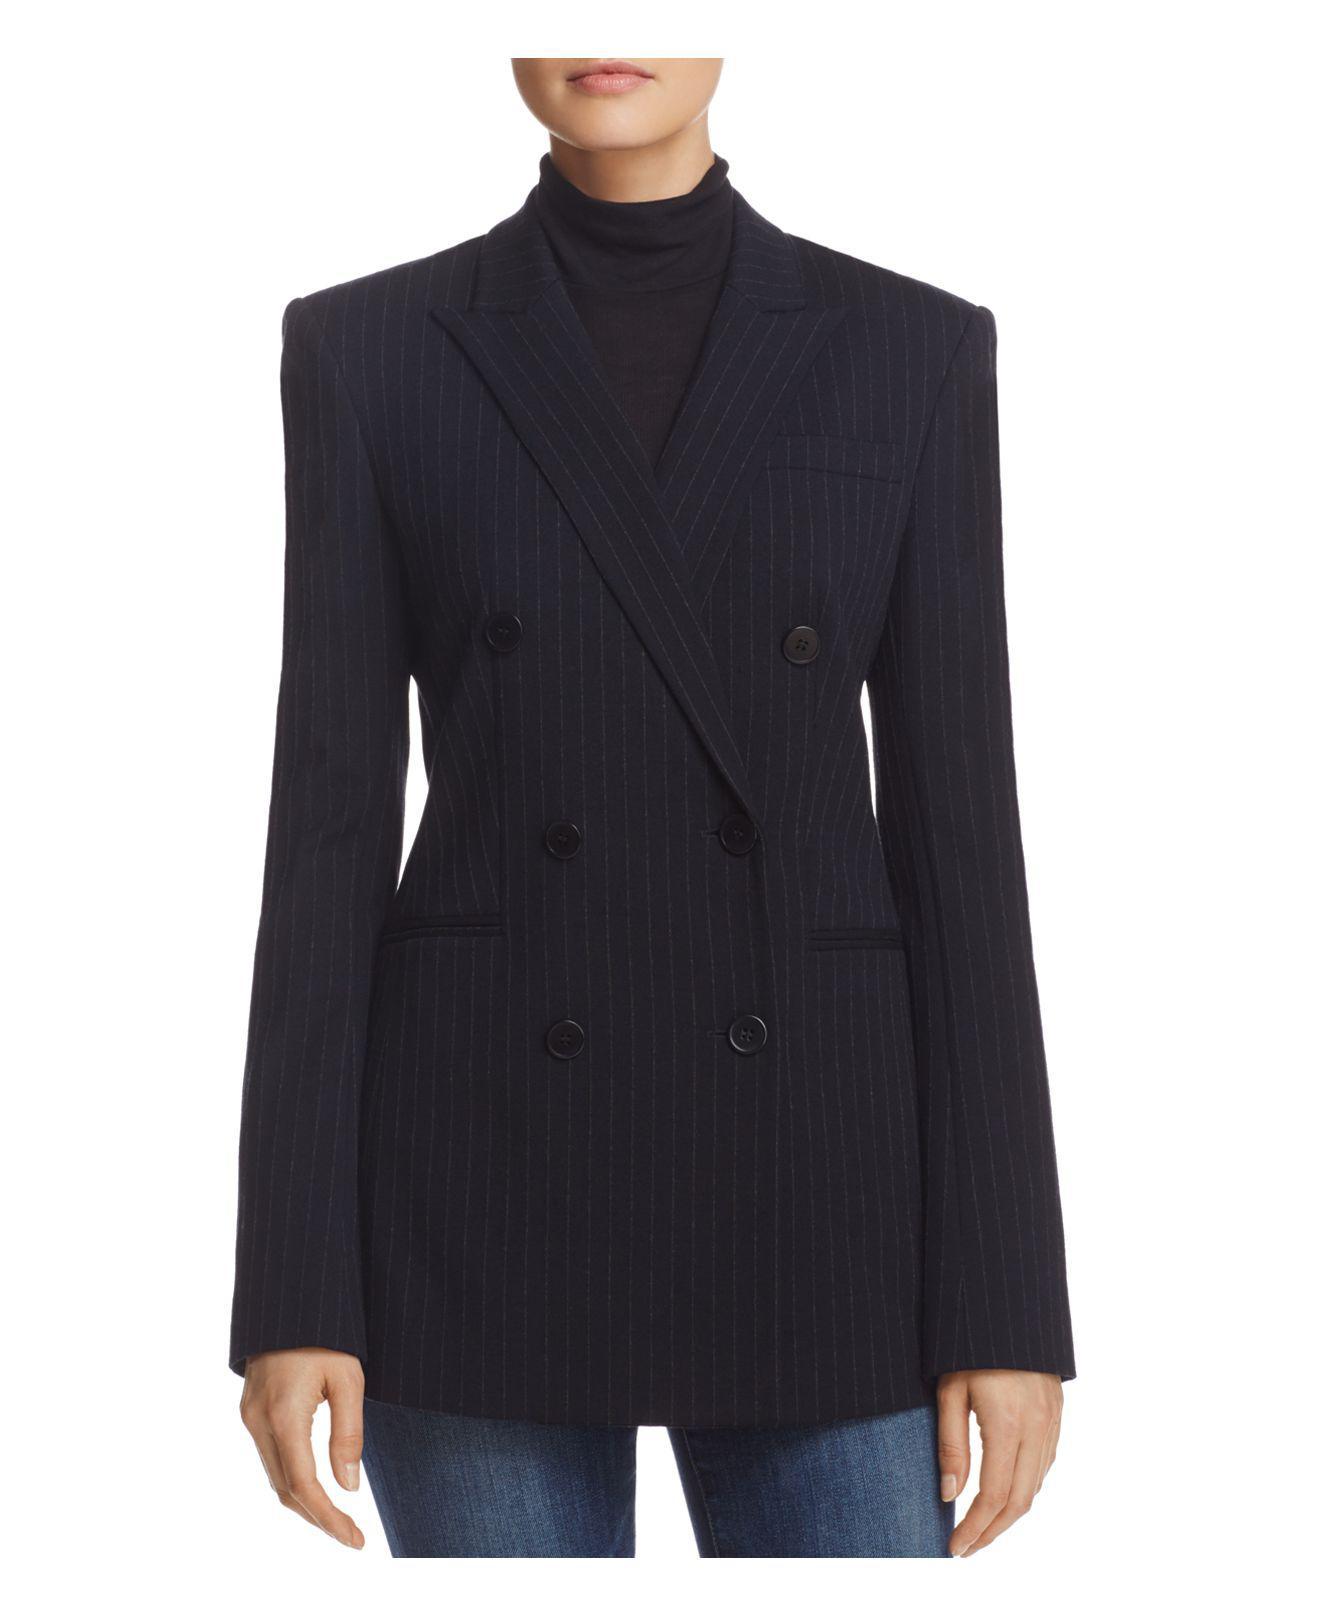 NEW MENS Tessori Dark Navy Pinstripe Blazer Sportscoat